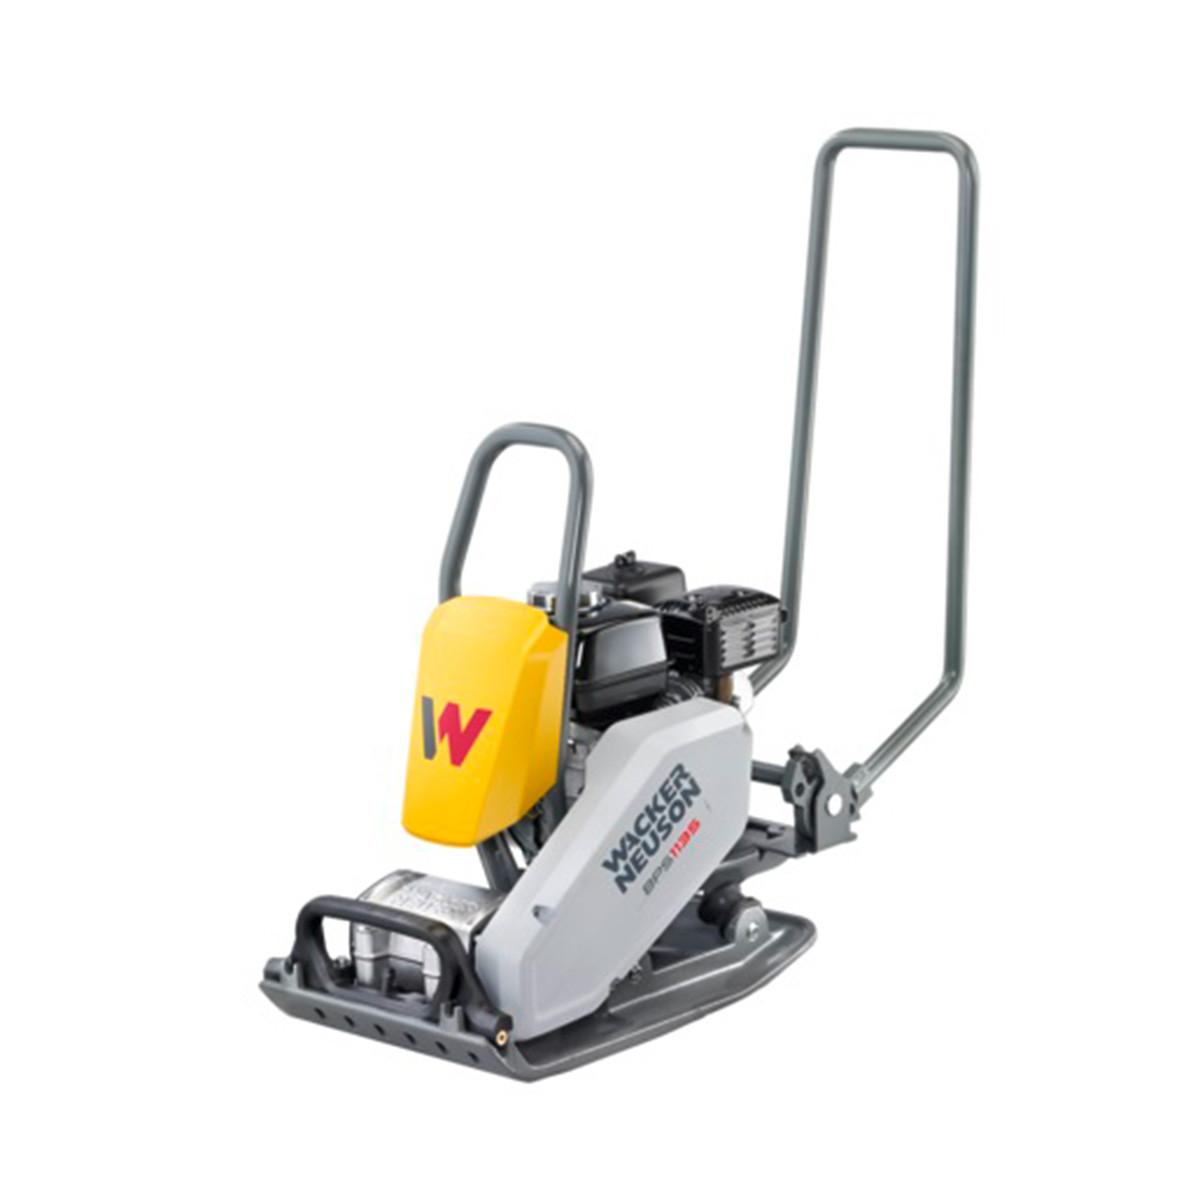 Wacker Vibratory Soil Plate motor